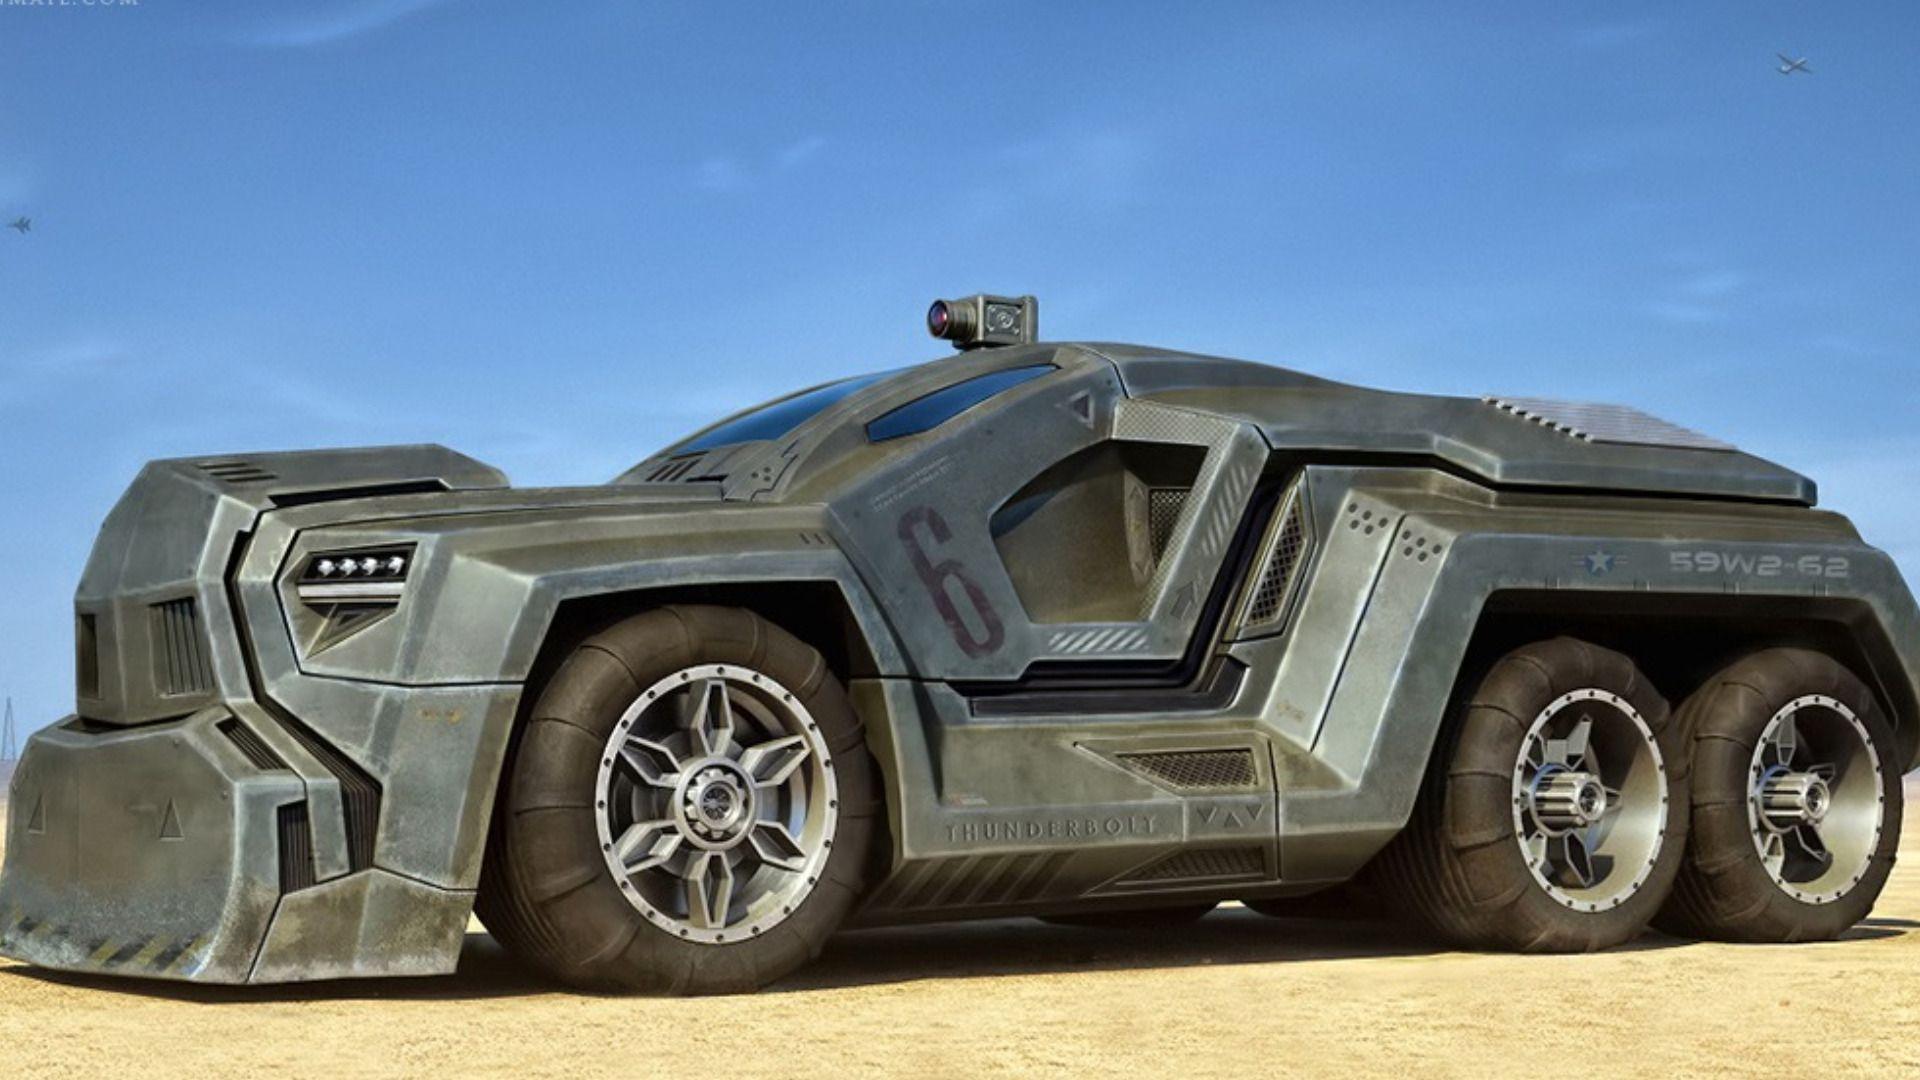 Fond Ecran Hd Science Fiction Wallpaper 2 748 All Images Vehicles Futuristic Cars Zombie Vehicle